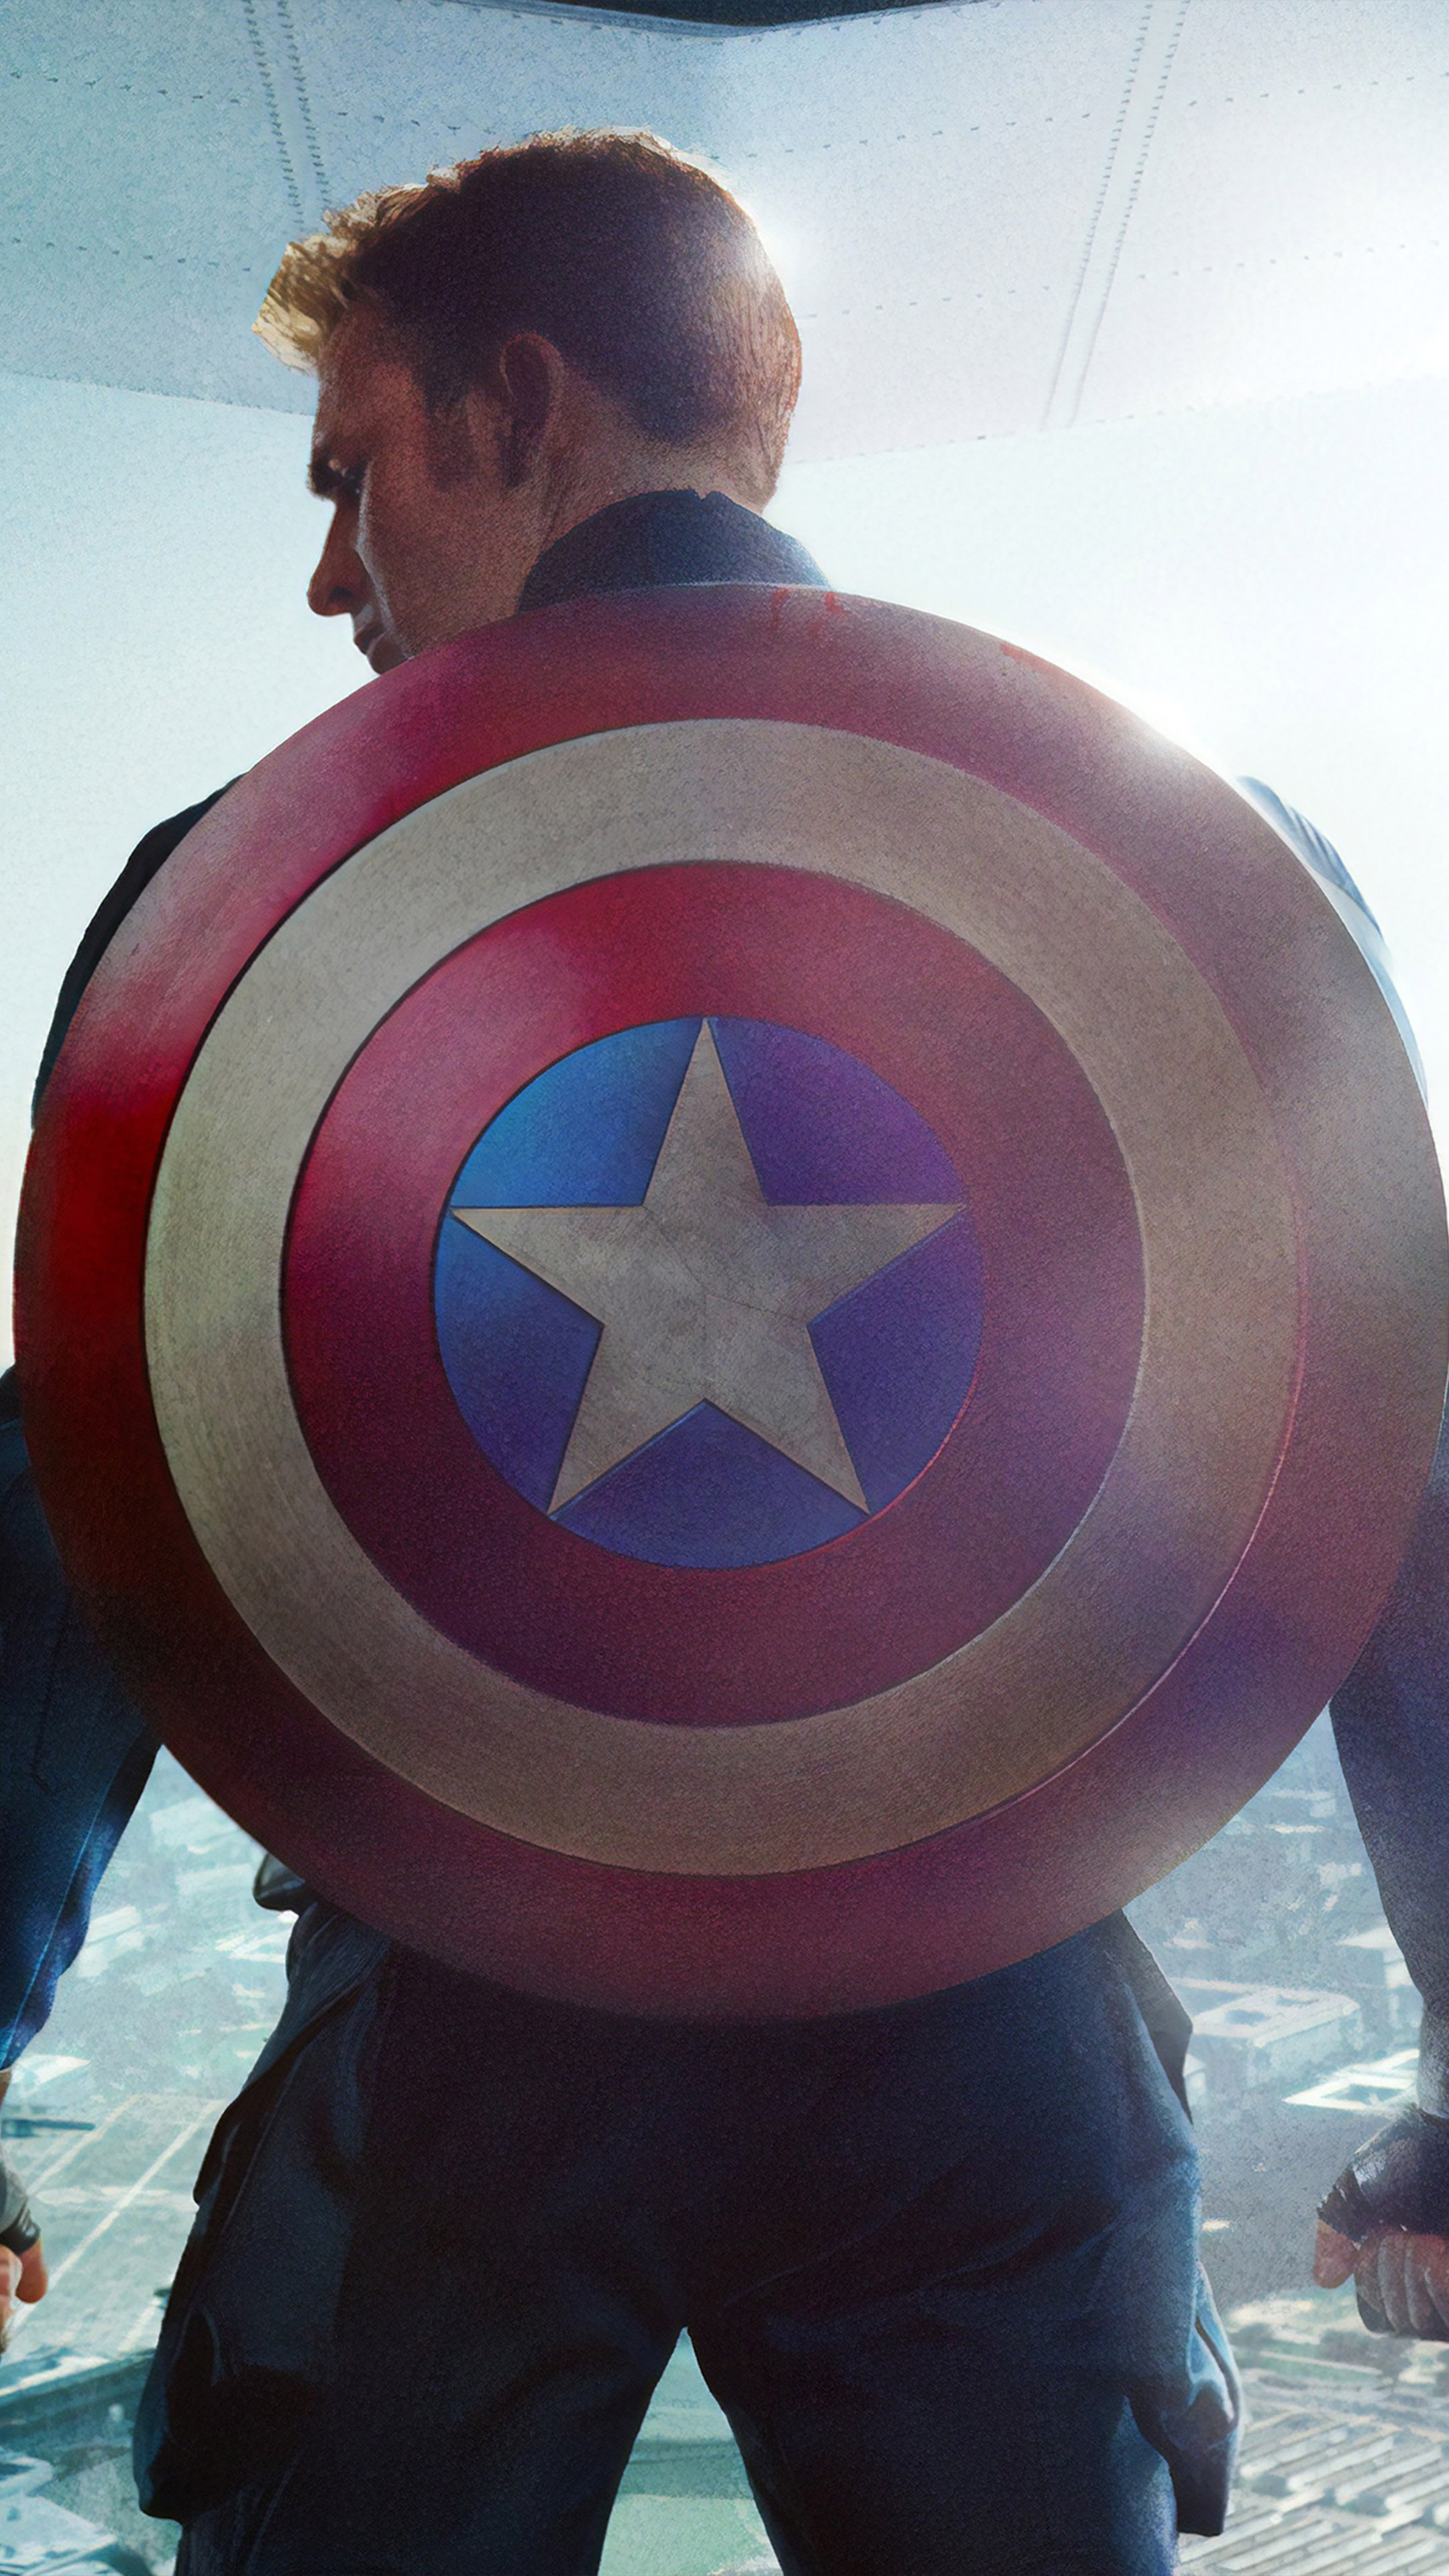 Chris Evans Captain America Shield 4K Ultra HD Mobile ...